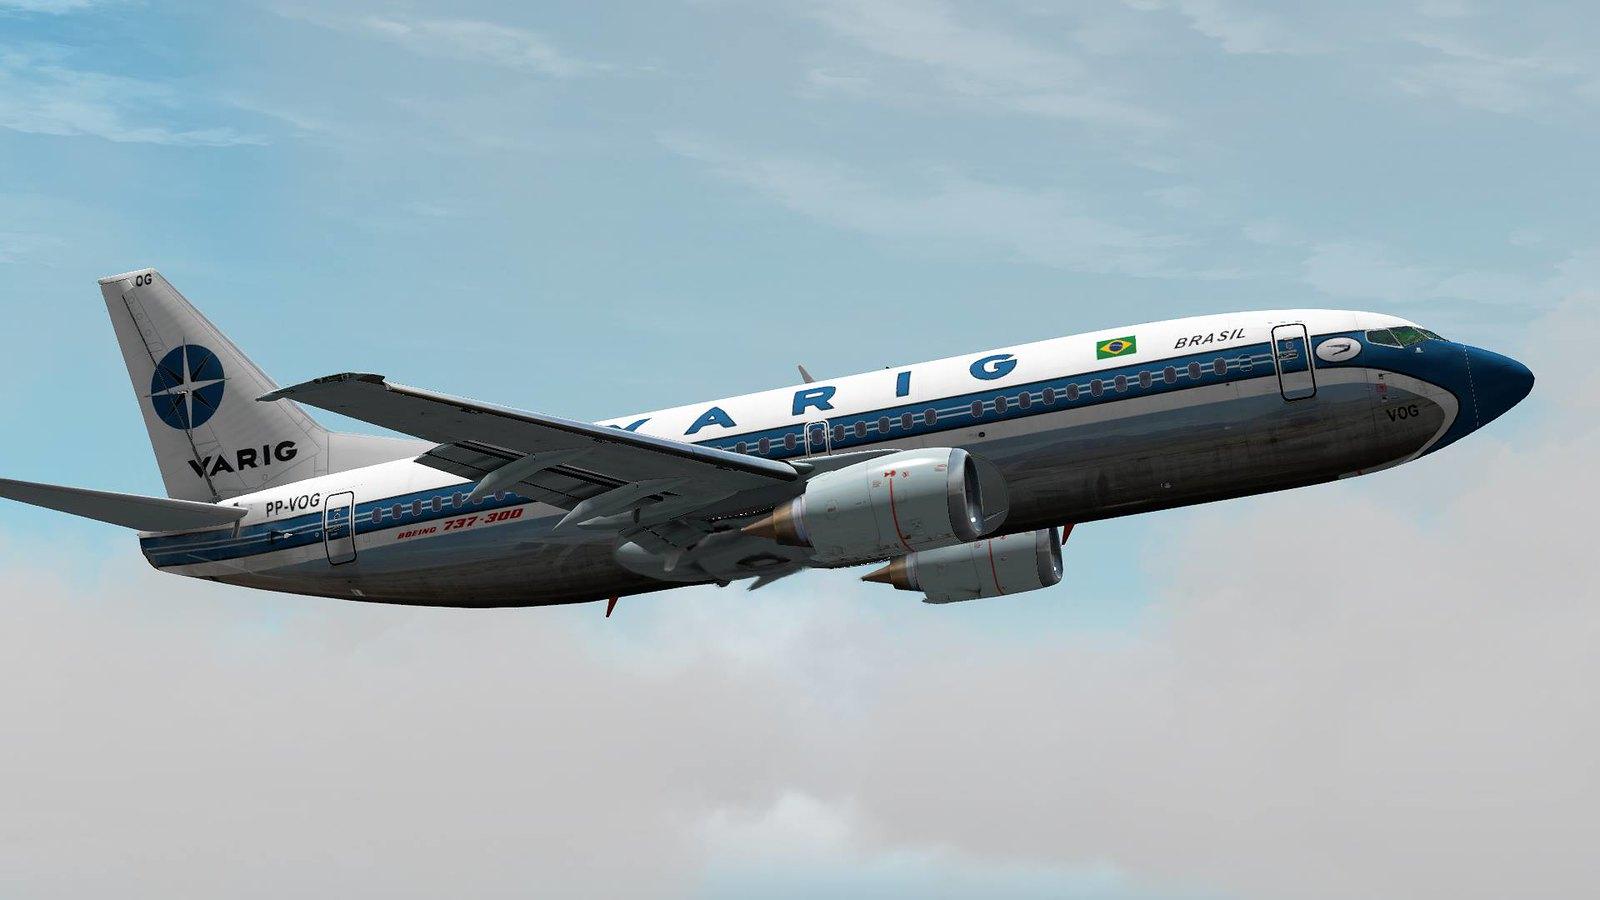 737-300 Varig - The AVSIM Screen Shots Forum - The AVSIM Community